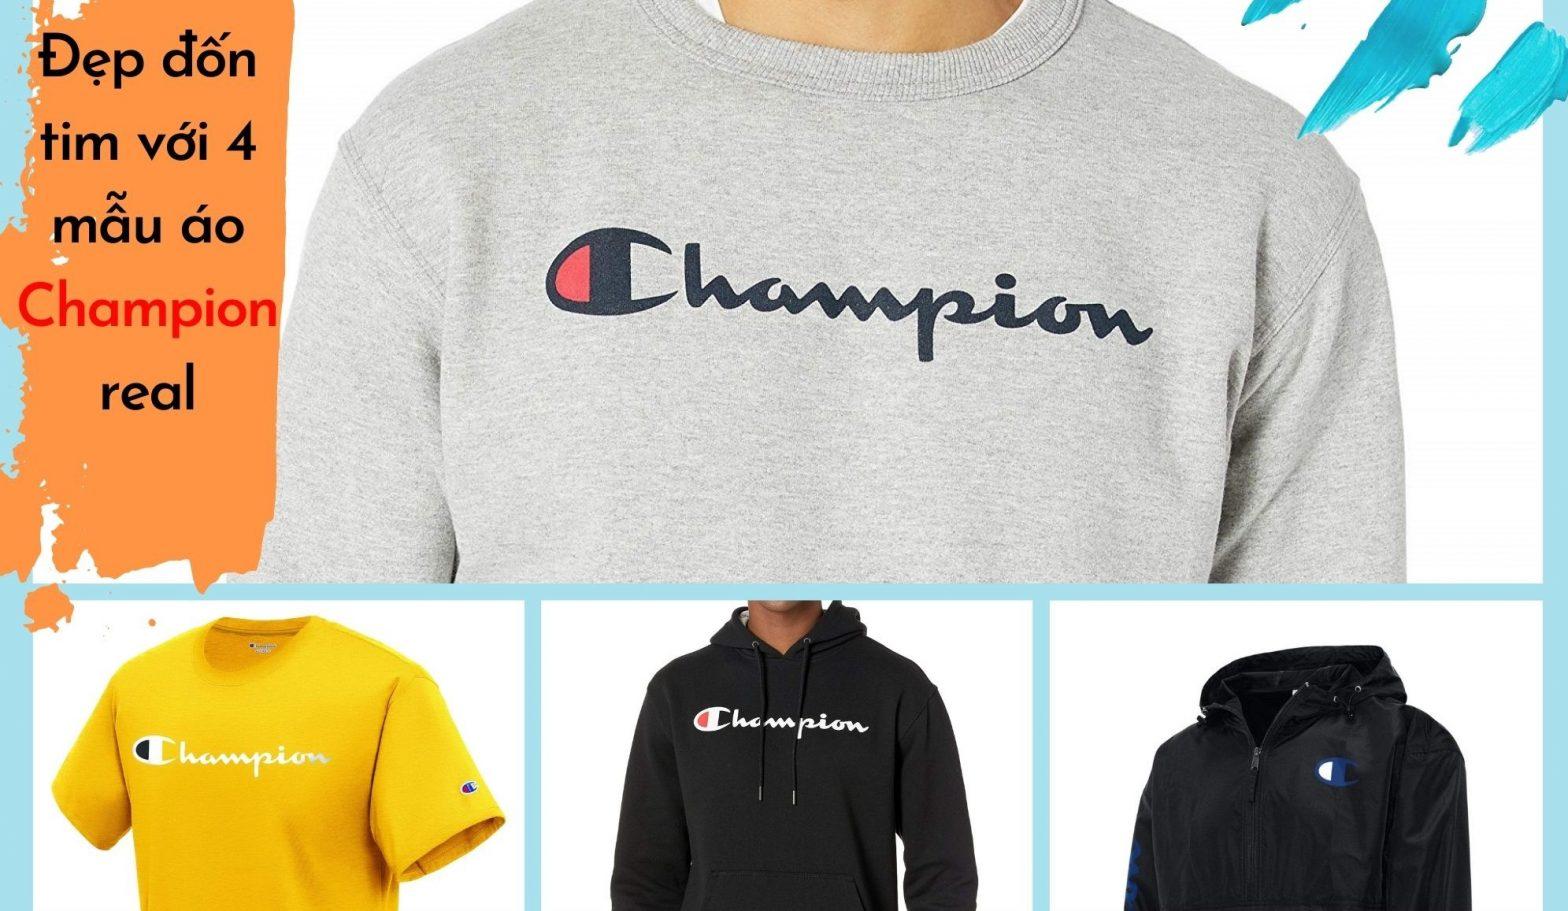 4 mau ao champion